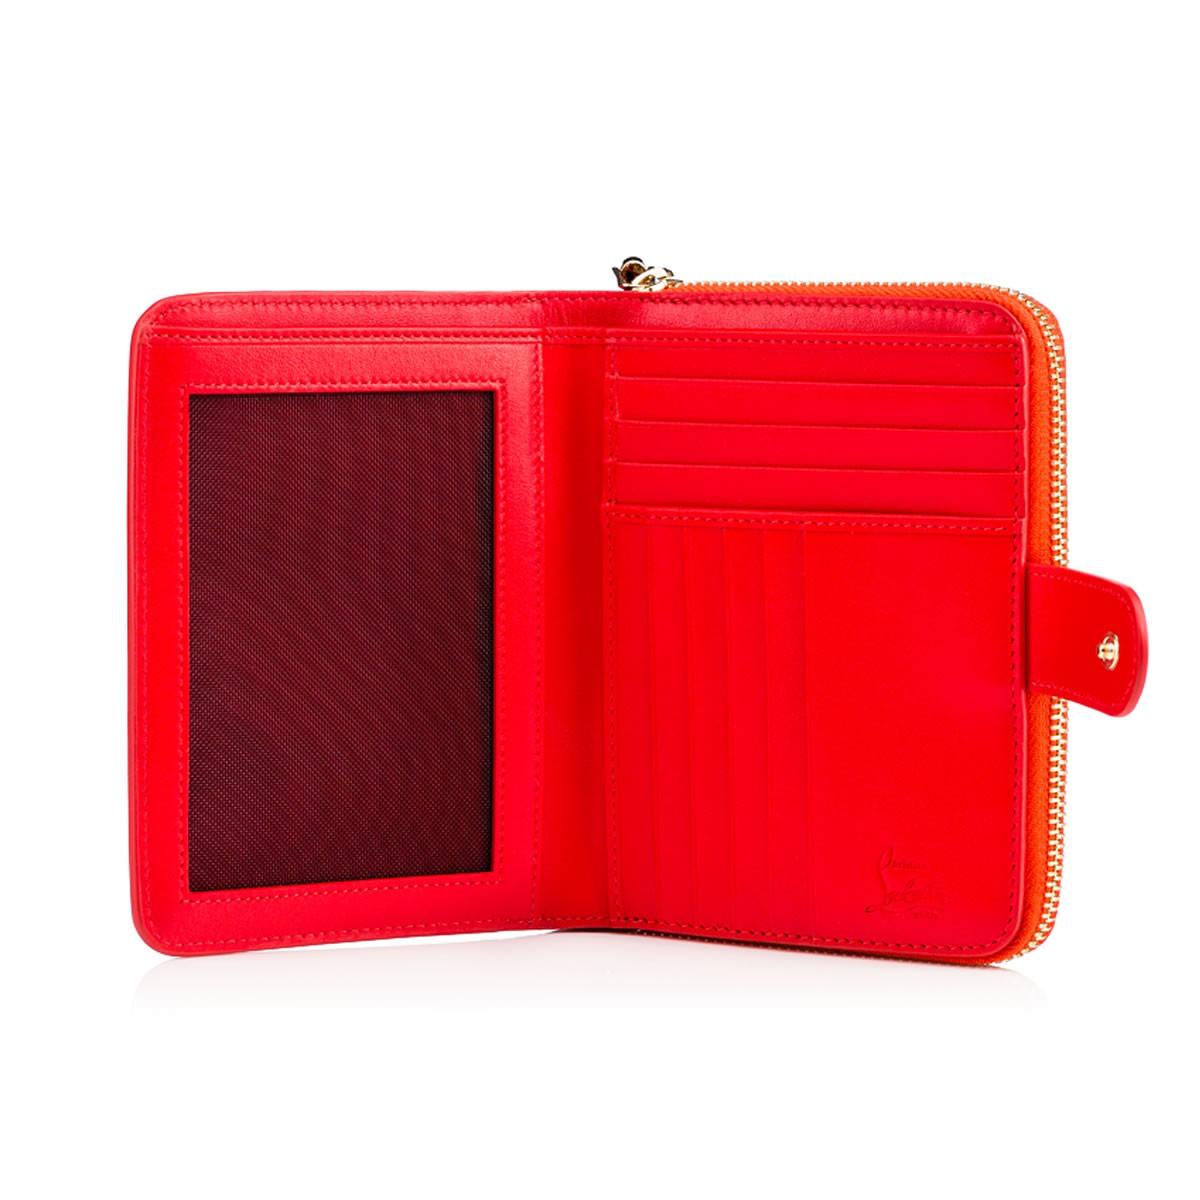 christian louboutin panettone zip around wallet | Landenberg ...